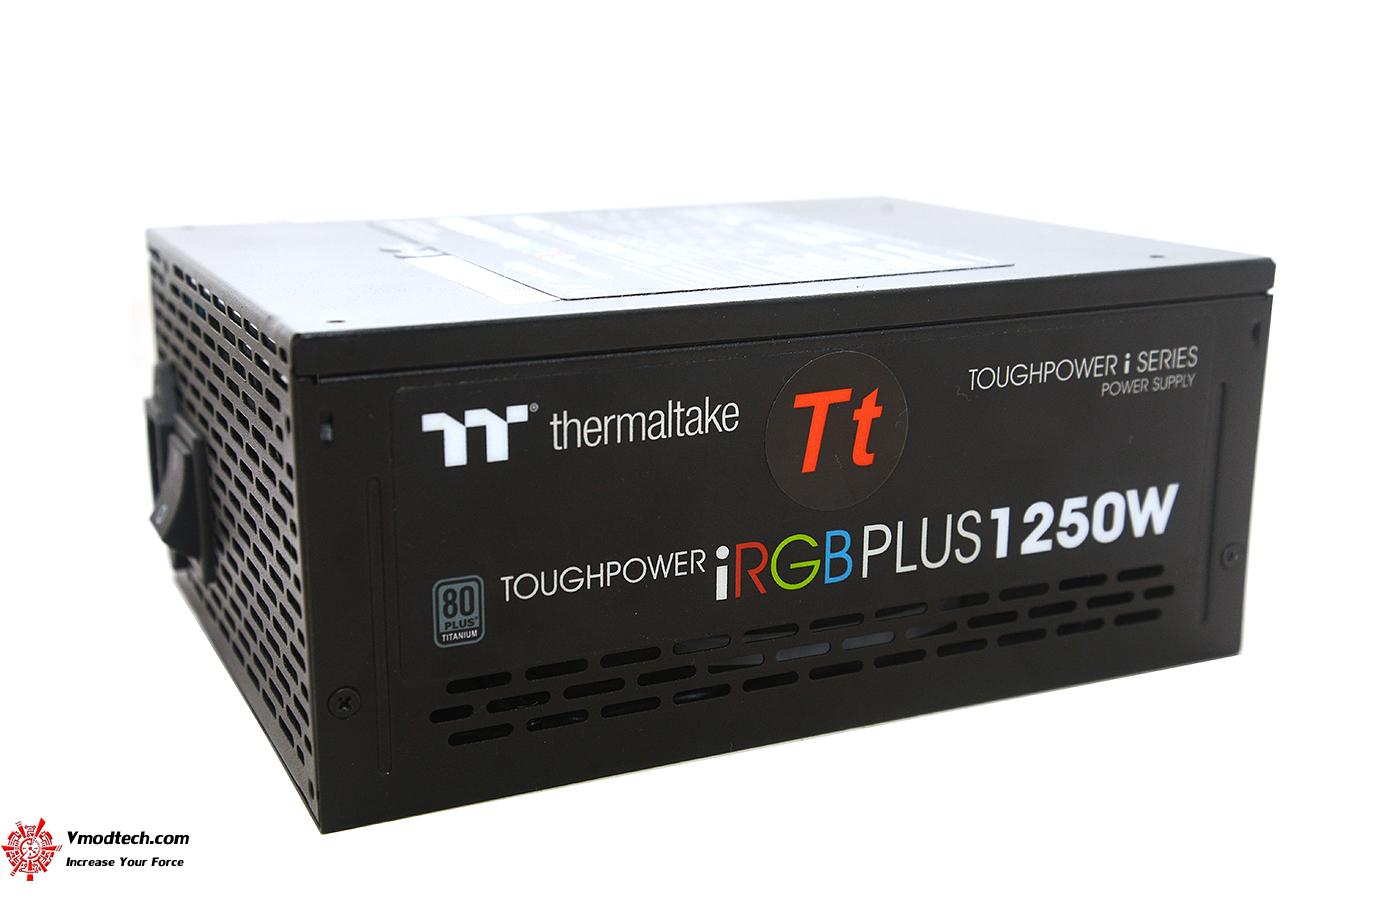 dsc 2560 Thermaltake Toughpower iRGB PLUS 1250W Titanium   TT Premium Edition Review